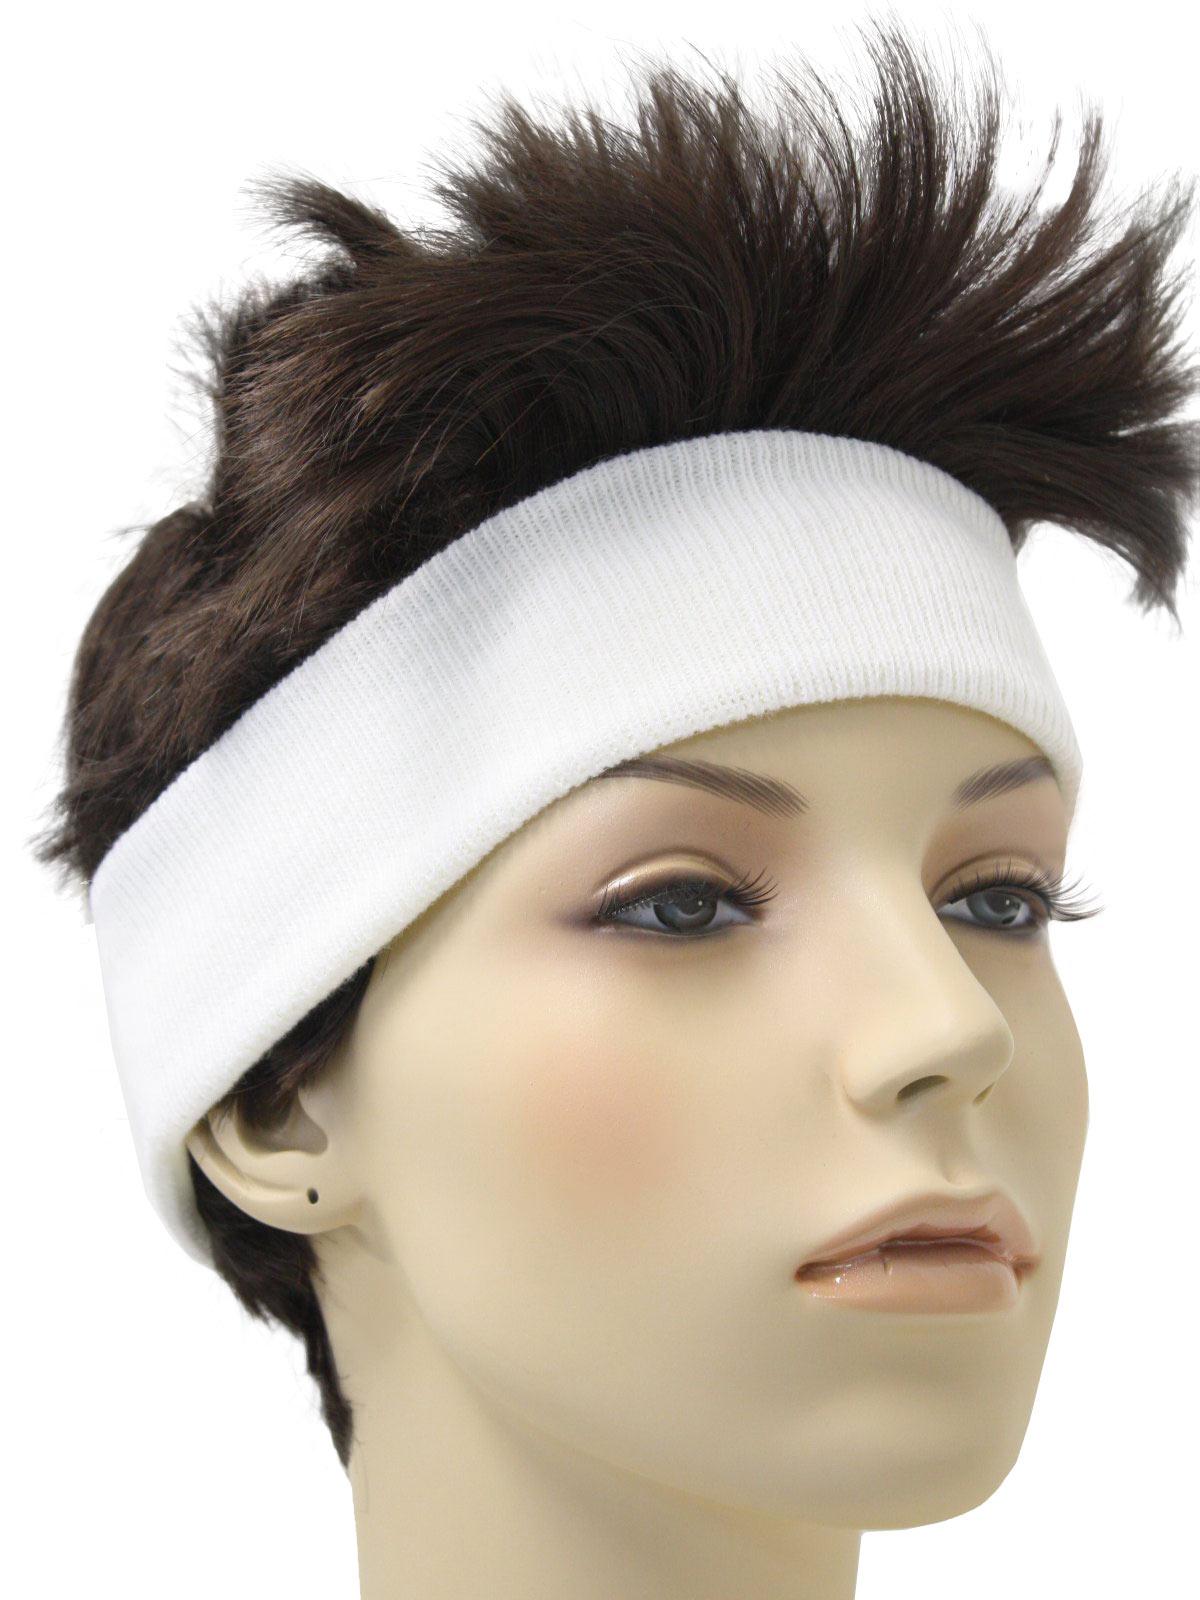 The 80s Headband  Comeback or Stuck in the 80s   5bfcd5837e2